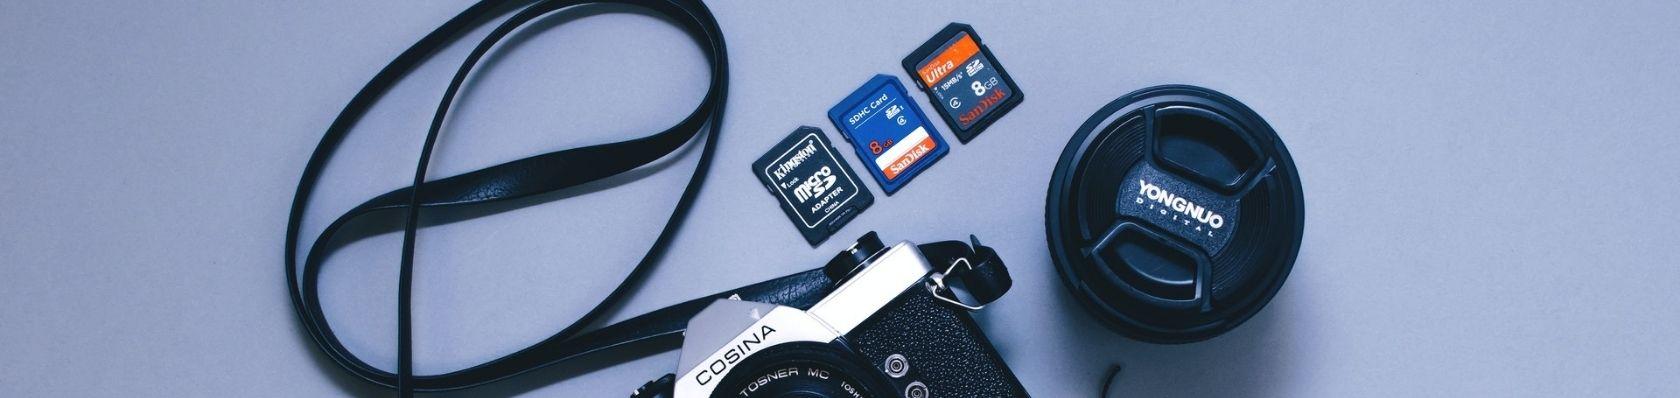 MicroSD im Test auf ExpertenTesten.de